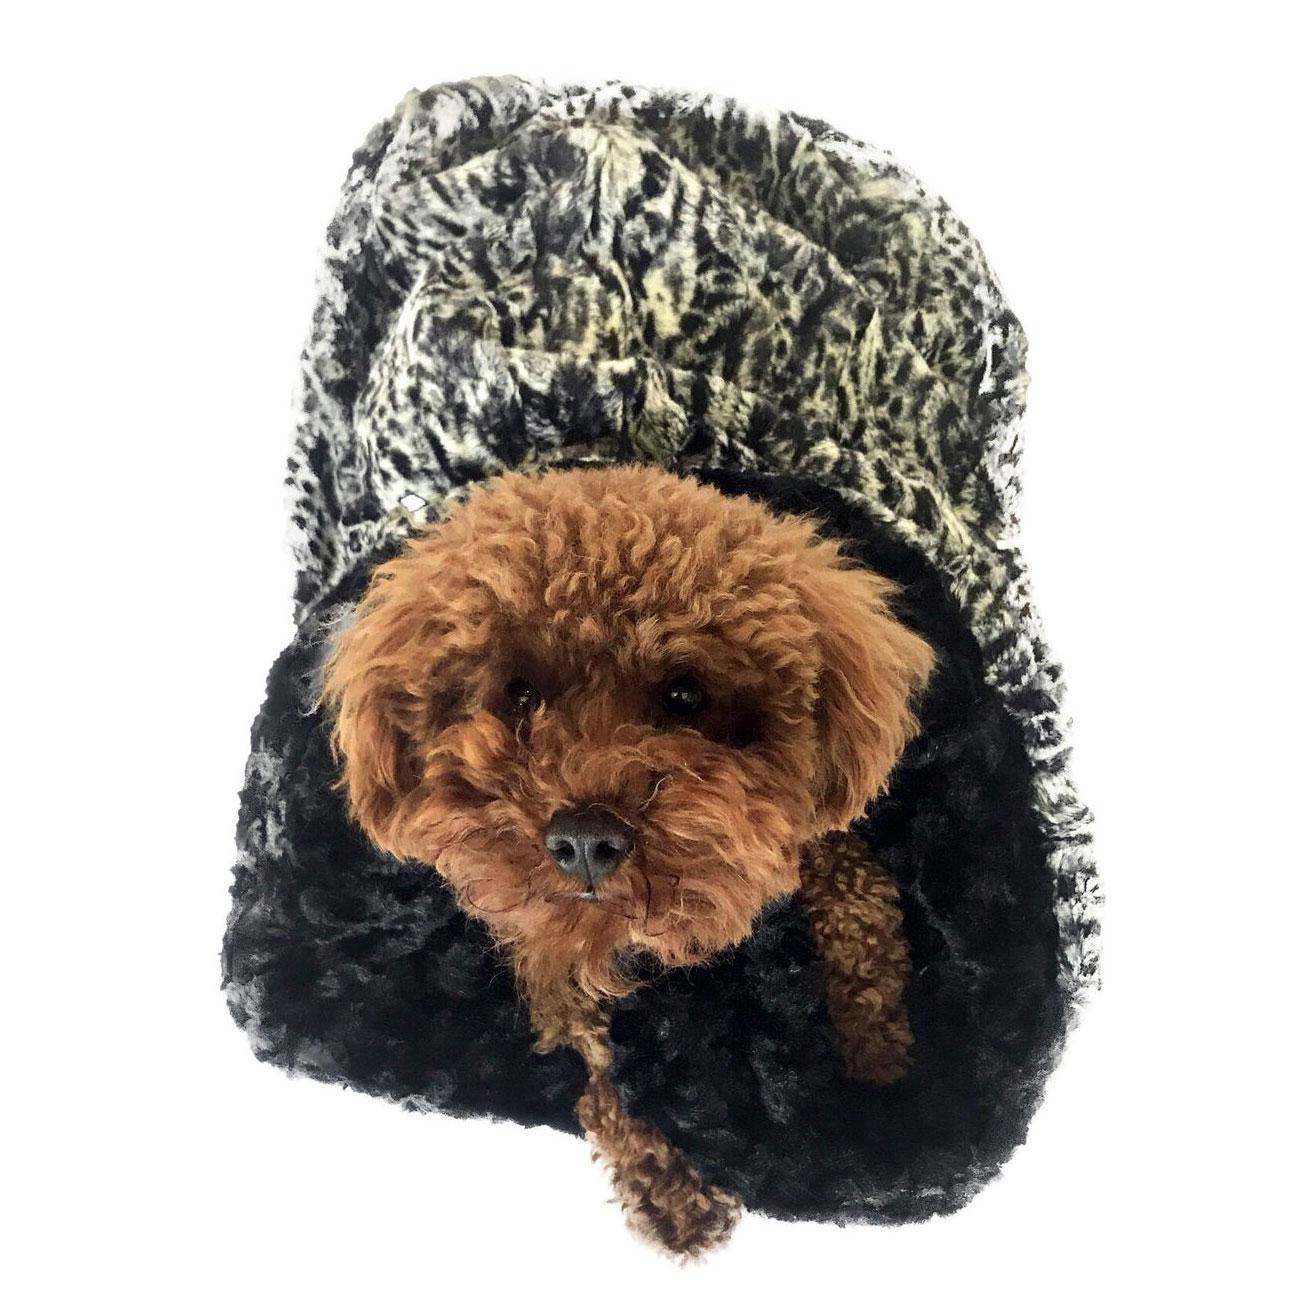 The Dog Squad Cozy Sak Plush Dog Bed, Black Spotted Leopard